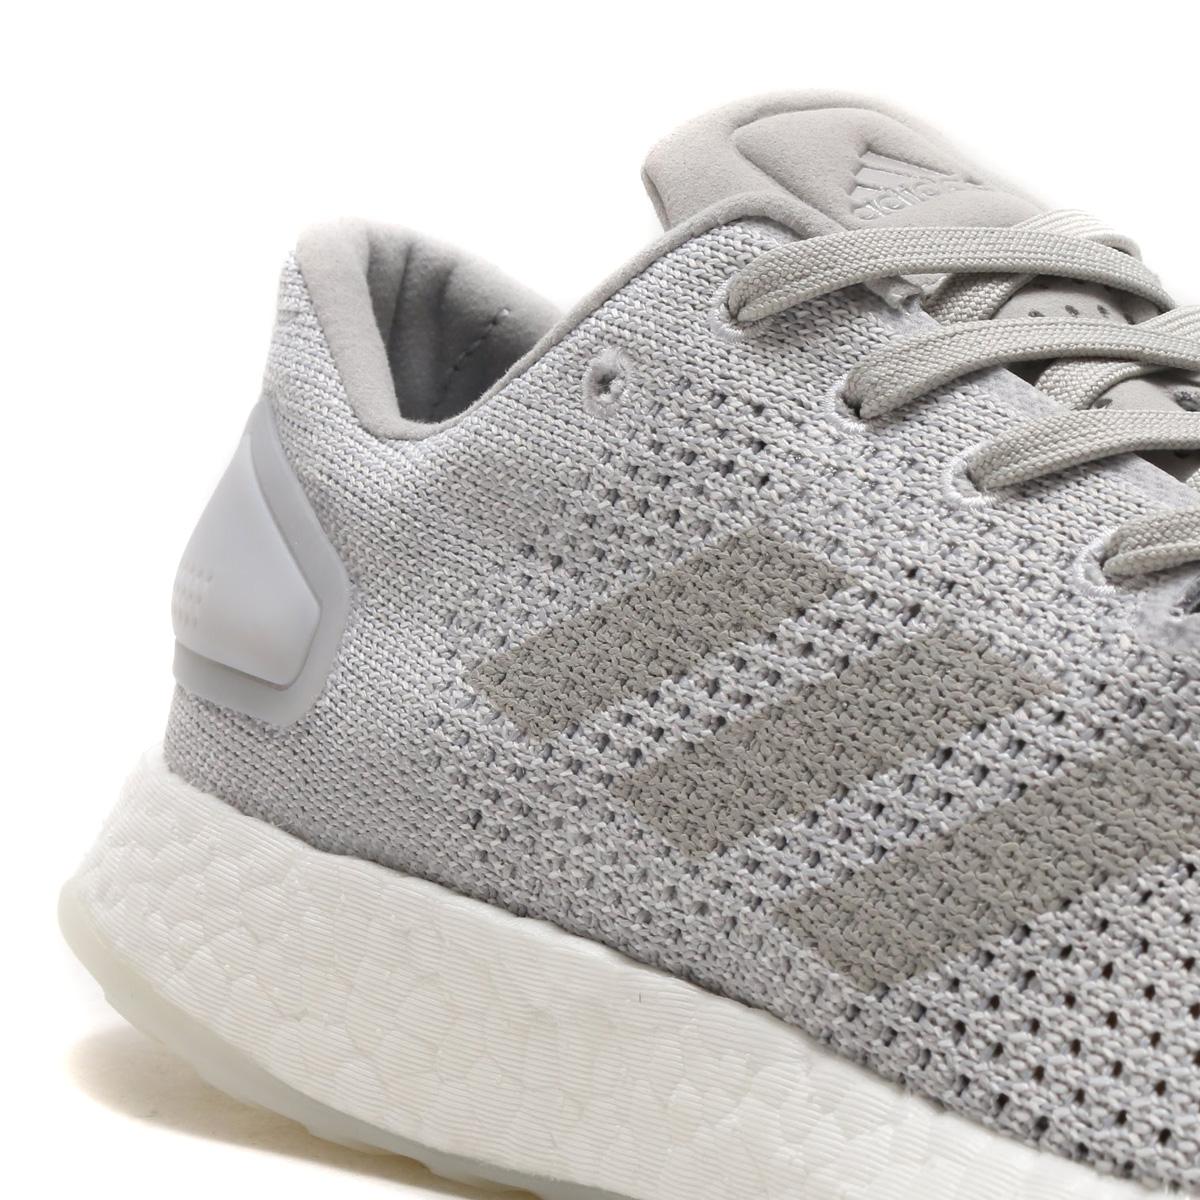 adidas Originals PureBOOST DPR LTD (Adidas originals pure boost DPR LTD) (gray TWO F17 gray TWO F17 running white) 18SS I